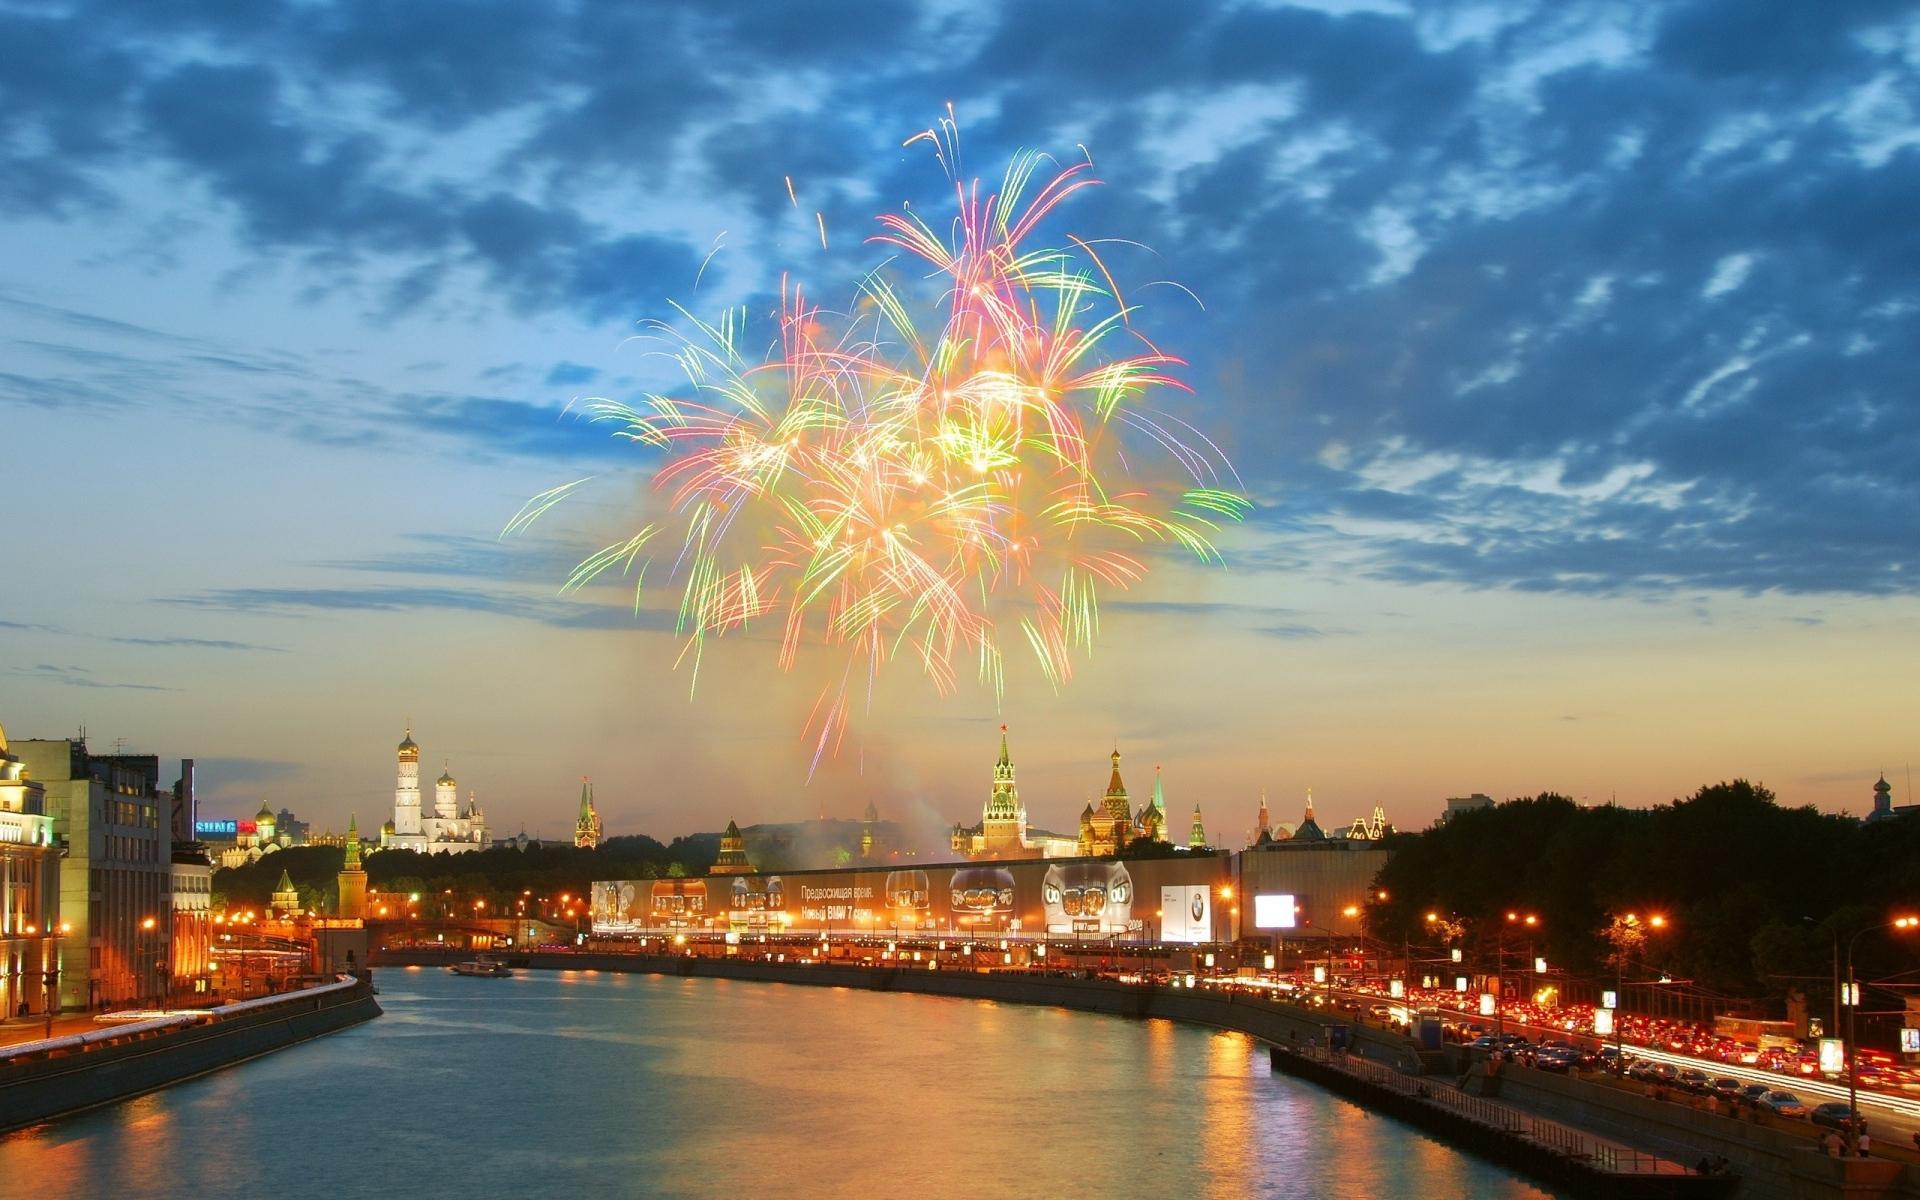 Картинки Река, фейерверк, кремль, москва фото и обои на рабочий стол